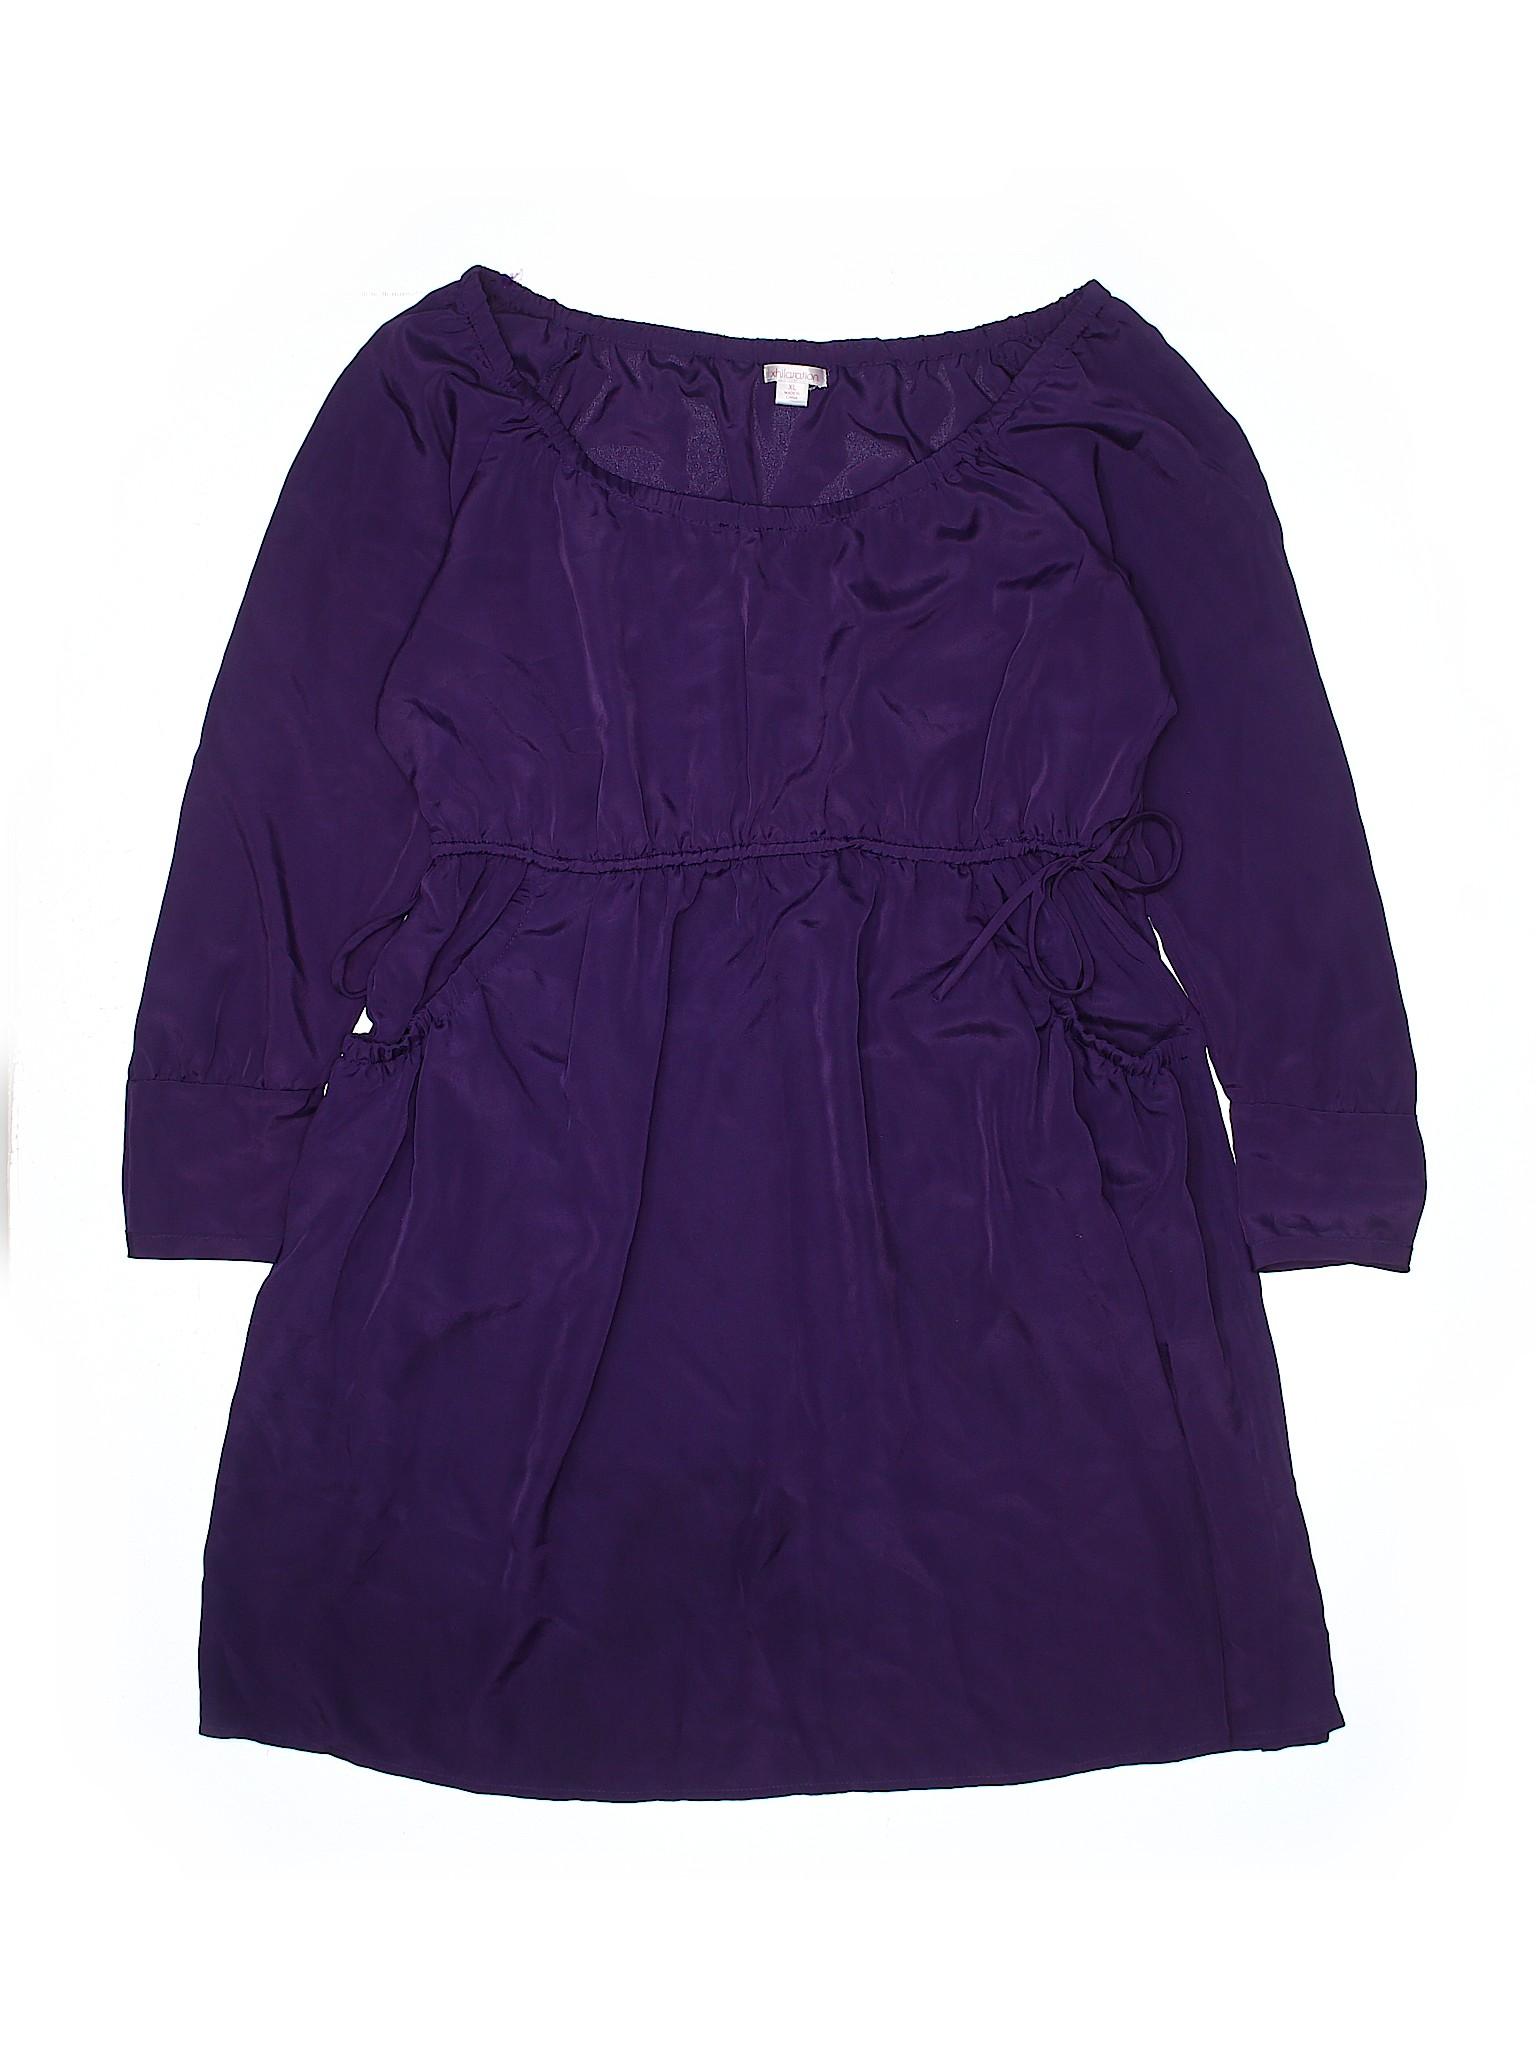 Dress Dress Selling Dress Xhilaration Xhilaration Selling Casual Casual Xhilaration Selling Casual qE1xHErn